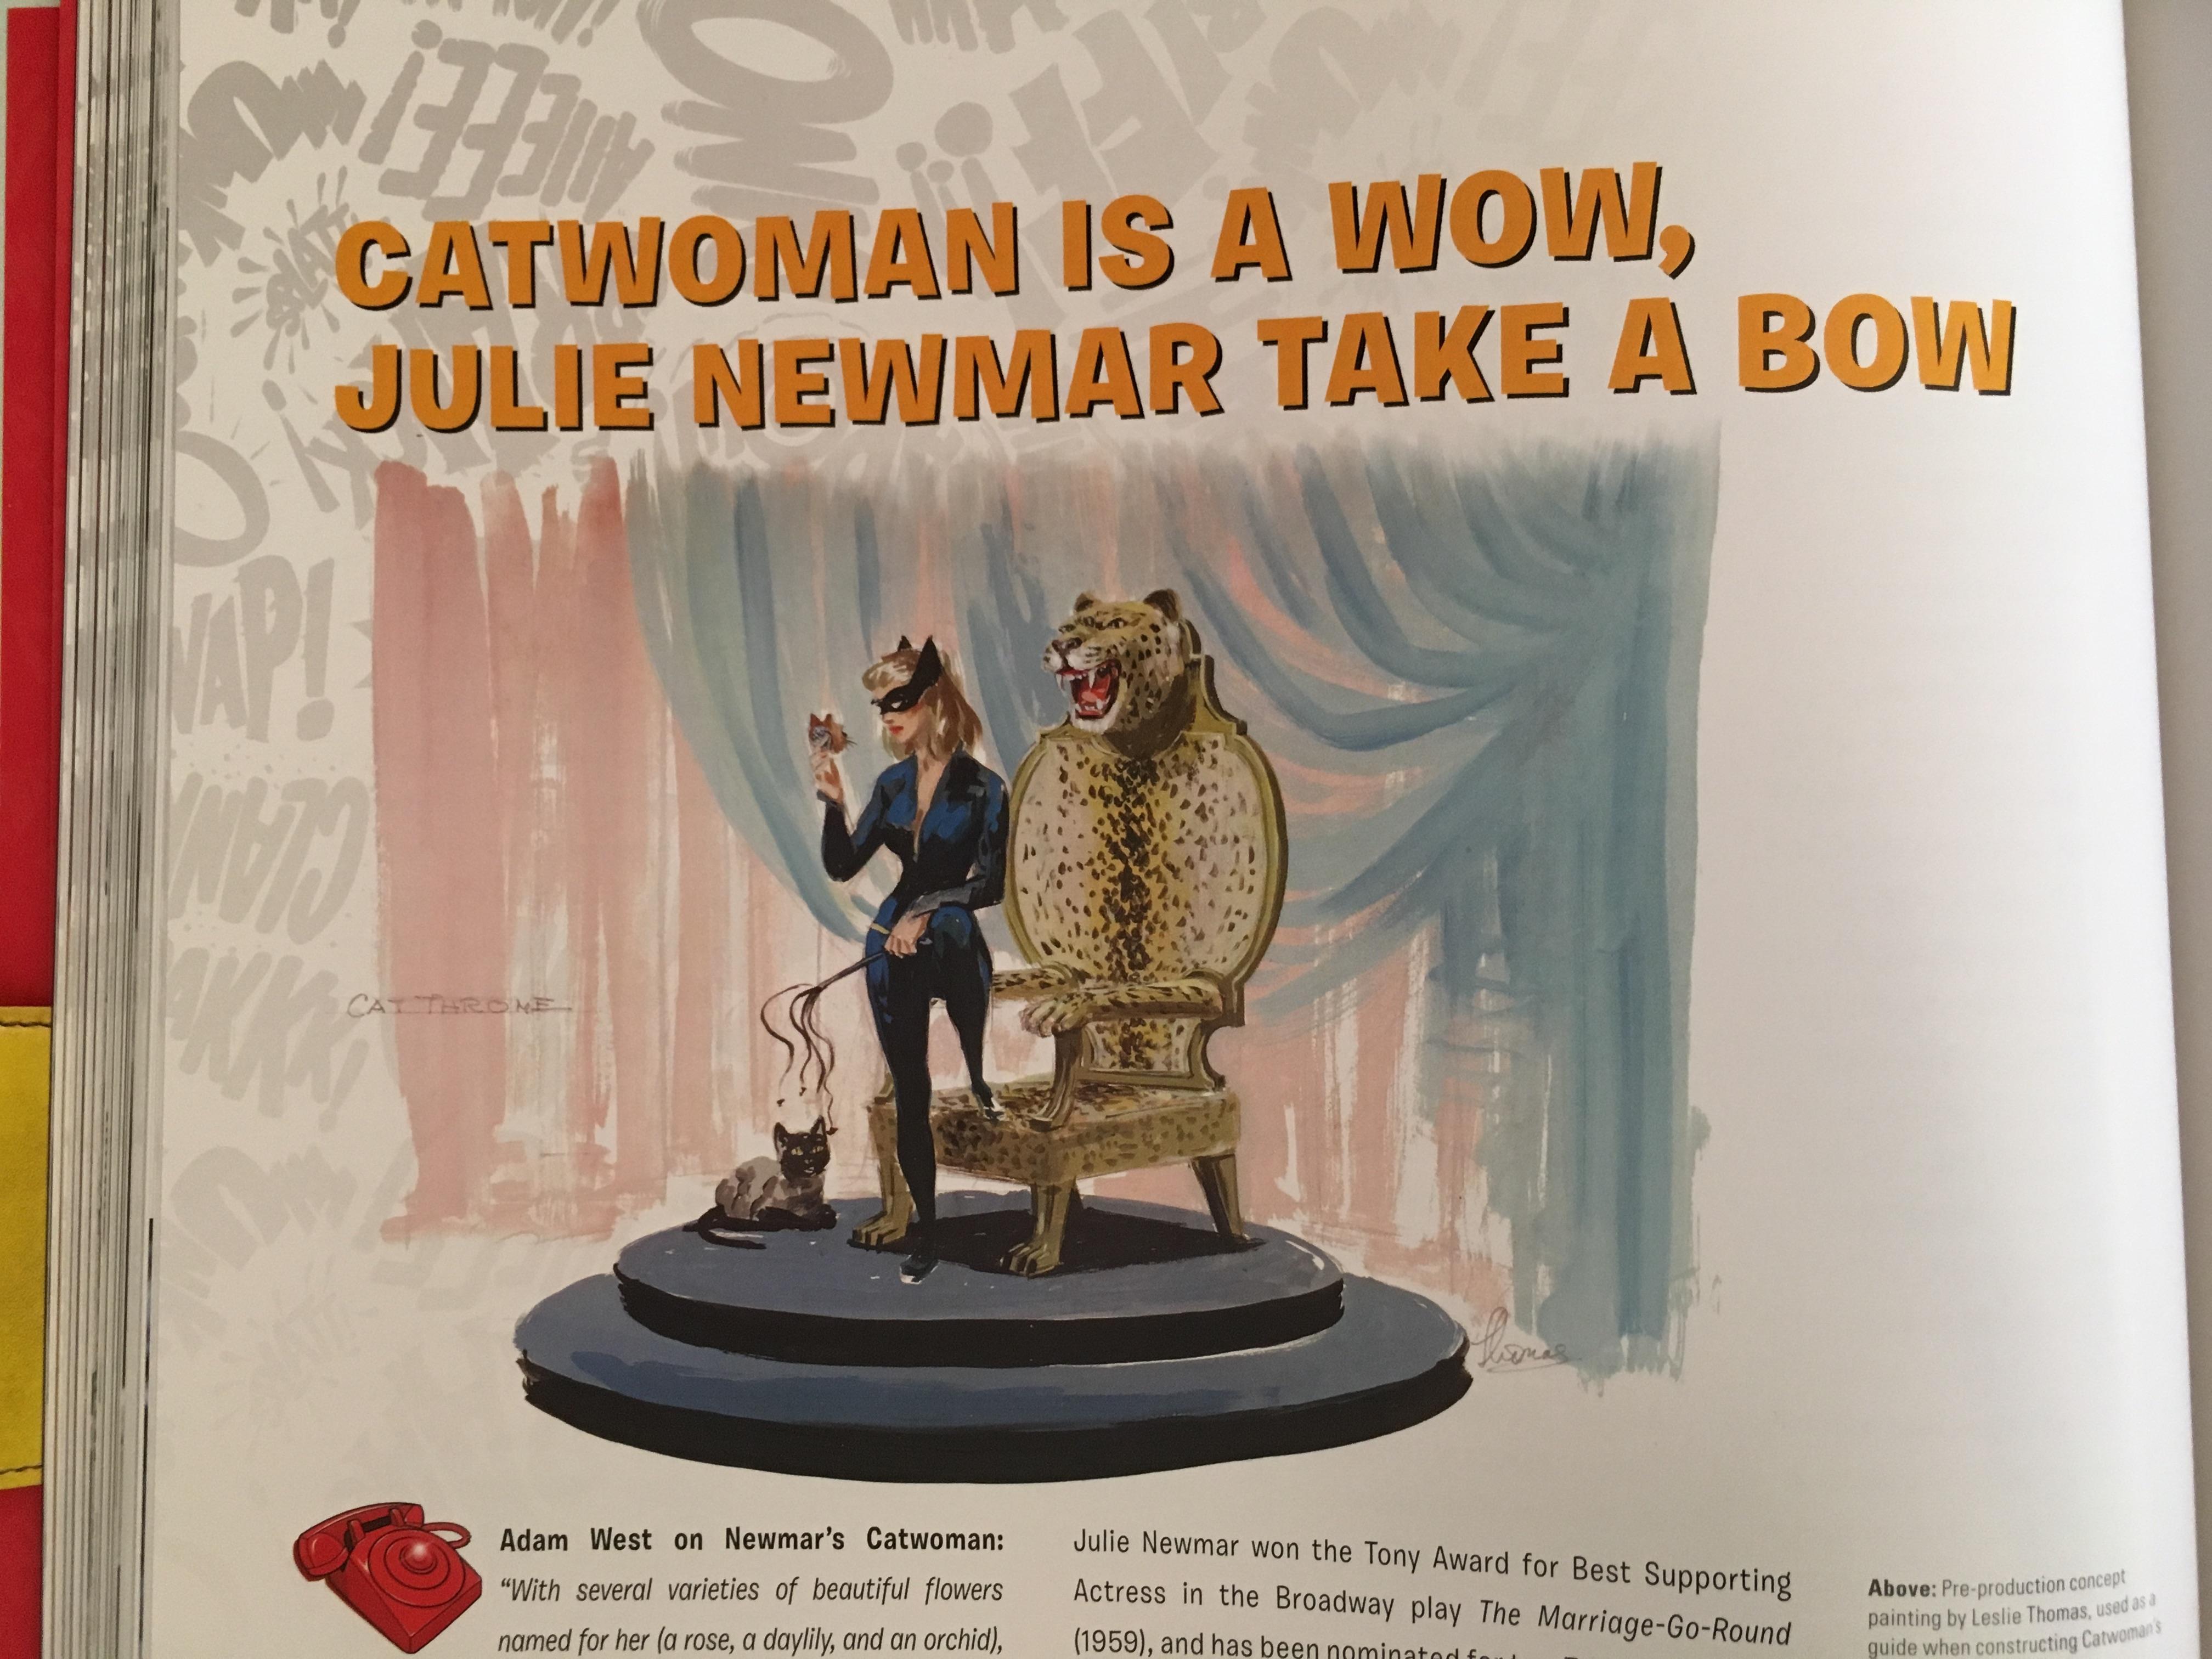 Catwoman -- as a blonde! (Julie Newmar has often worn her hair blonde.)